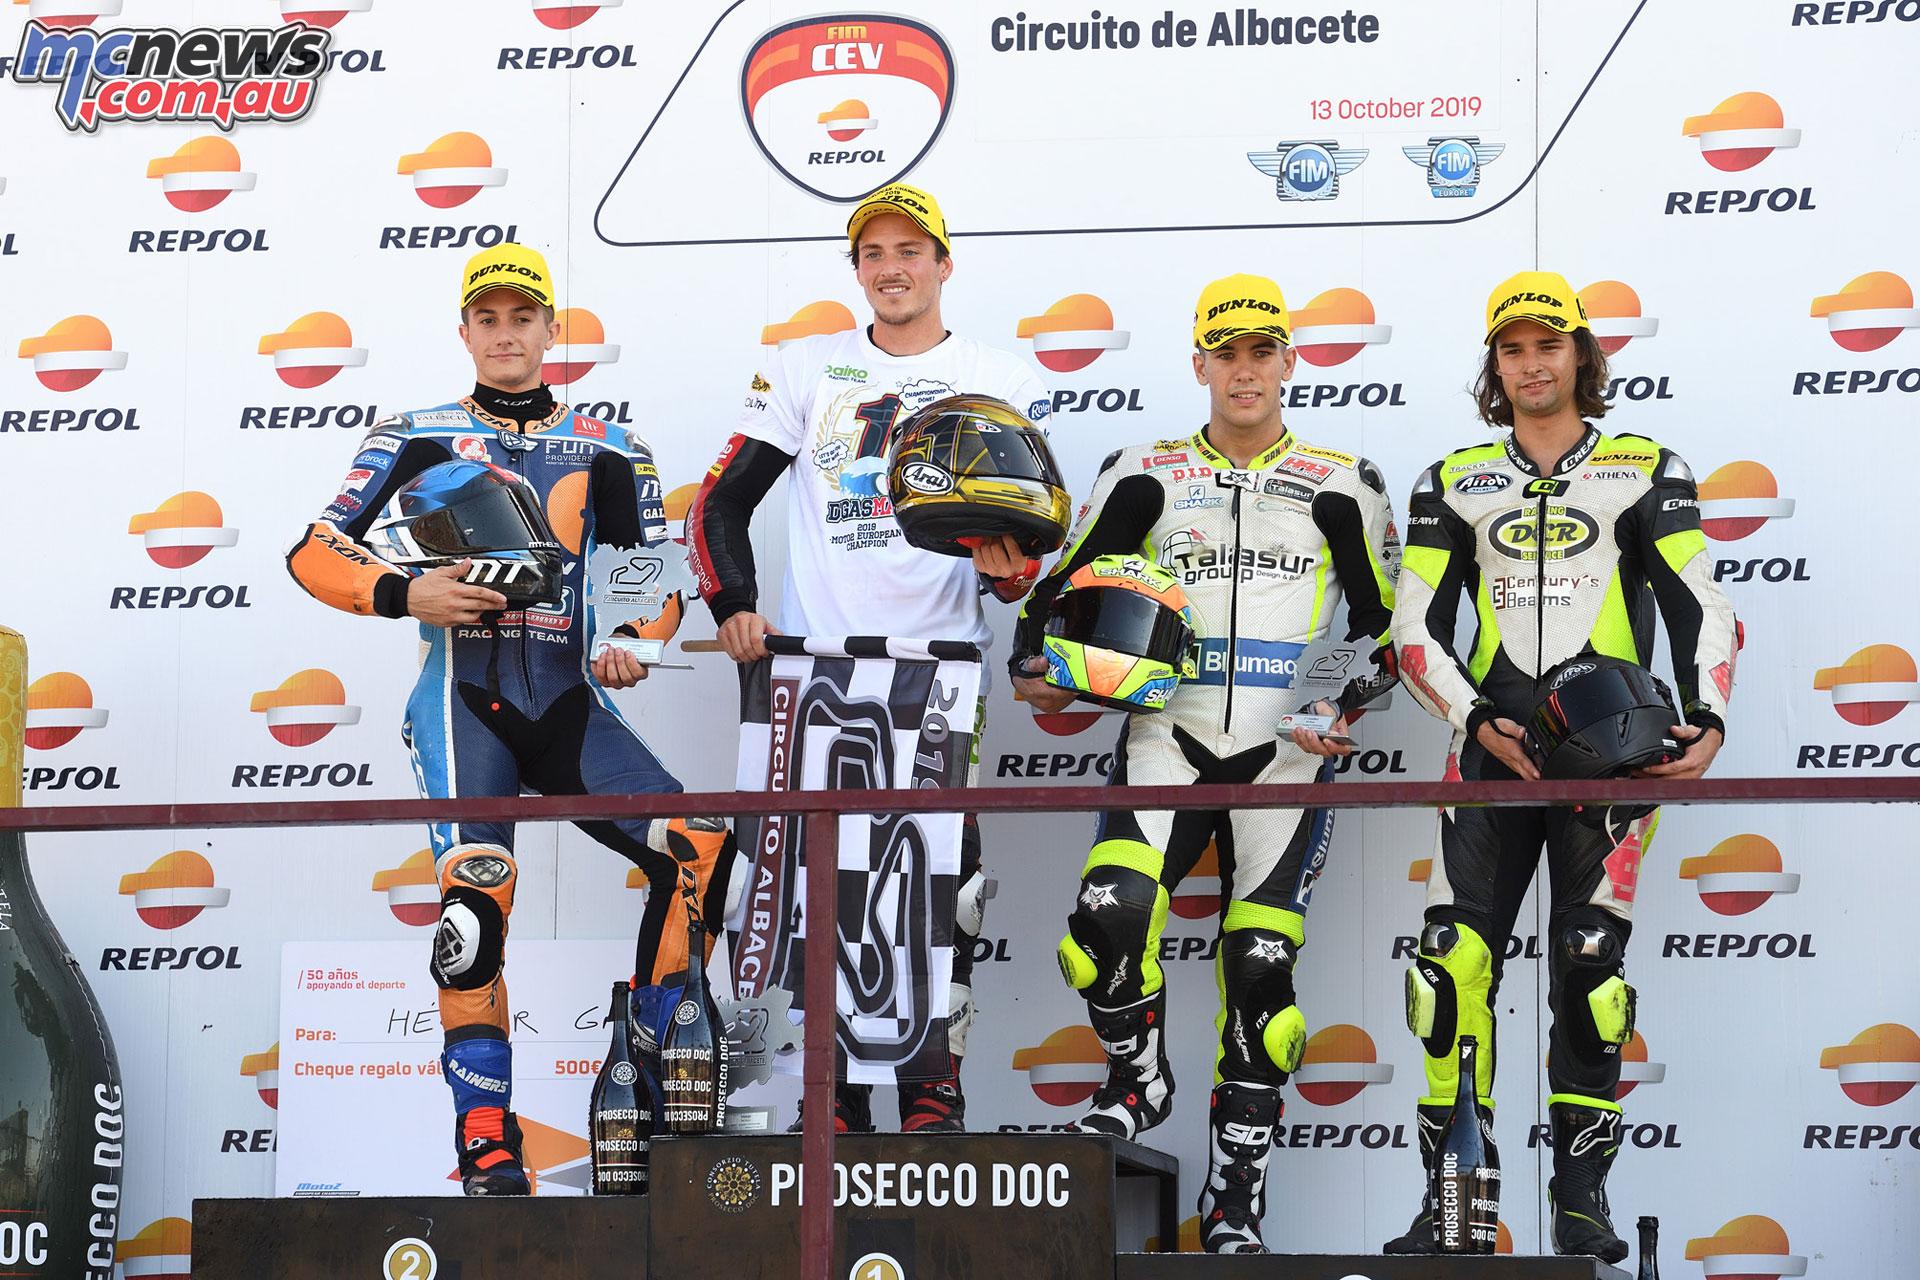 FIM CEV Repsol Rnd Albacete Podium Moto Race